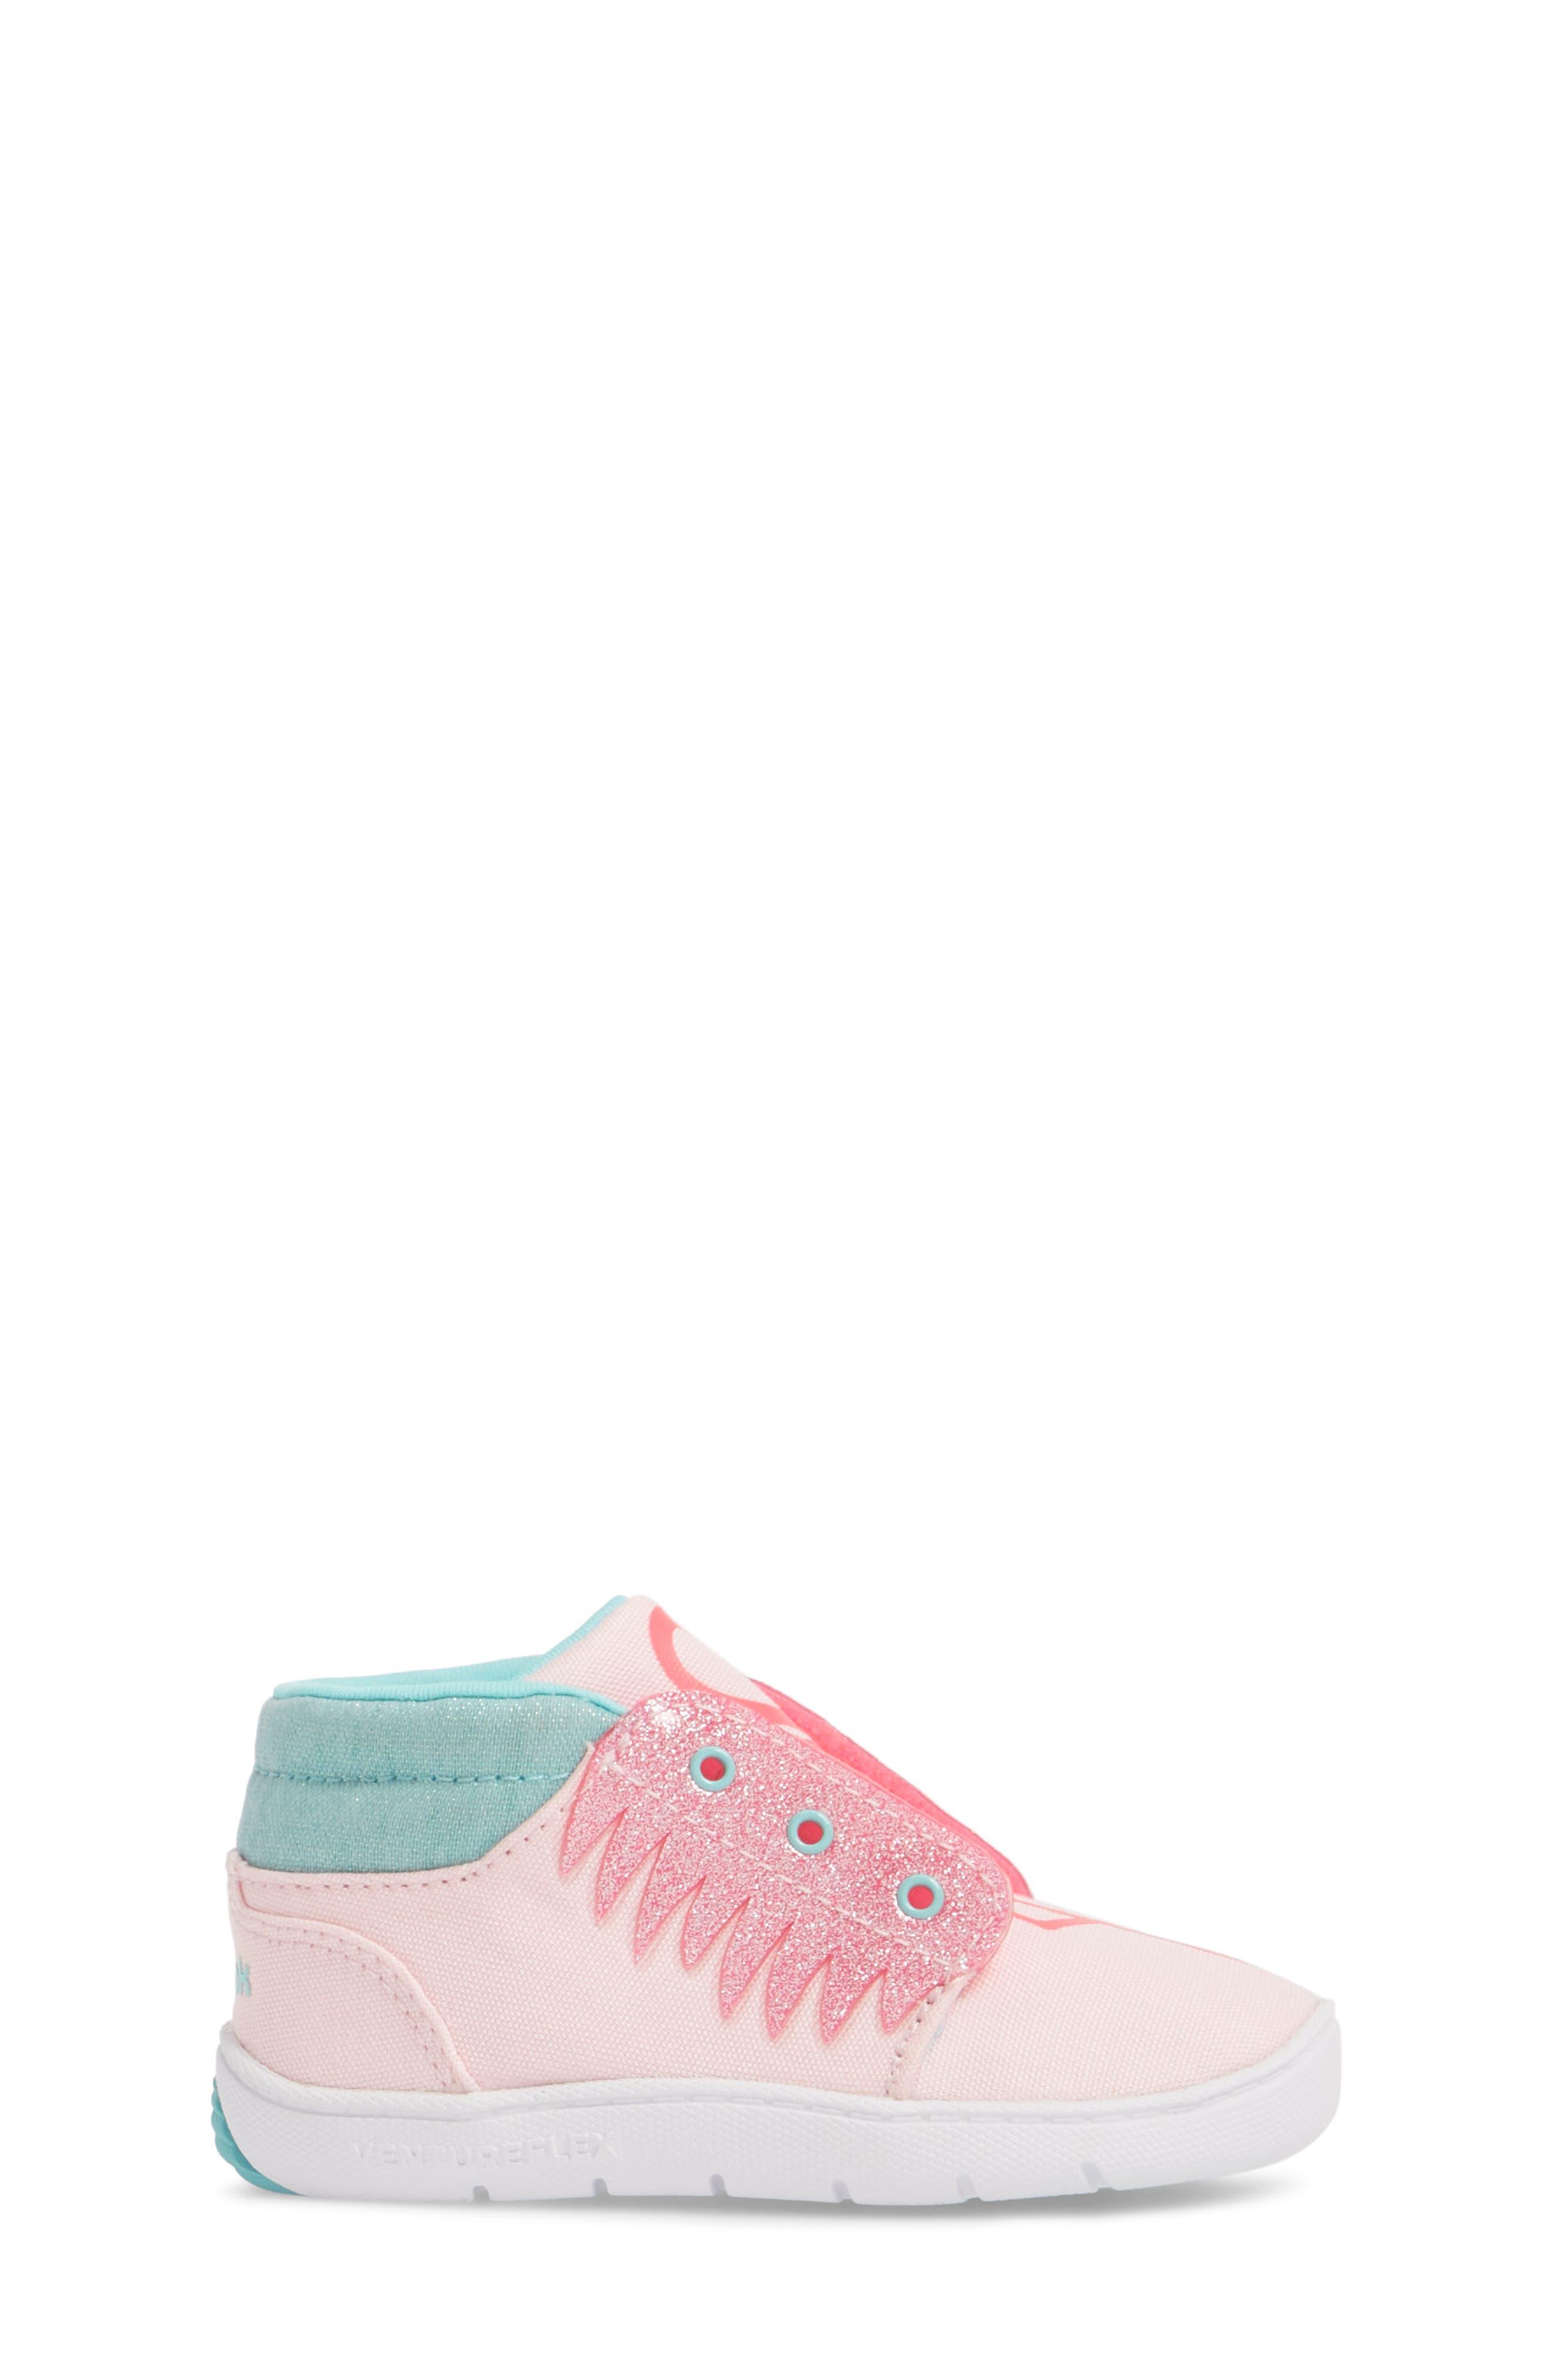 Ventureflex High Top Critter Sneaker,                             Alternate thumbnail 6, color,